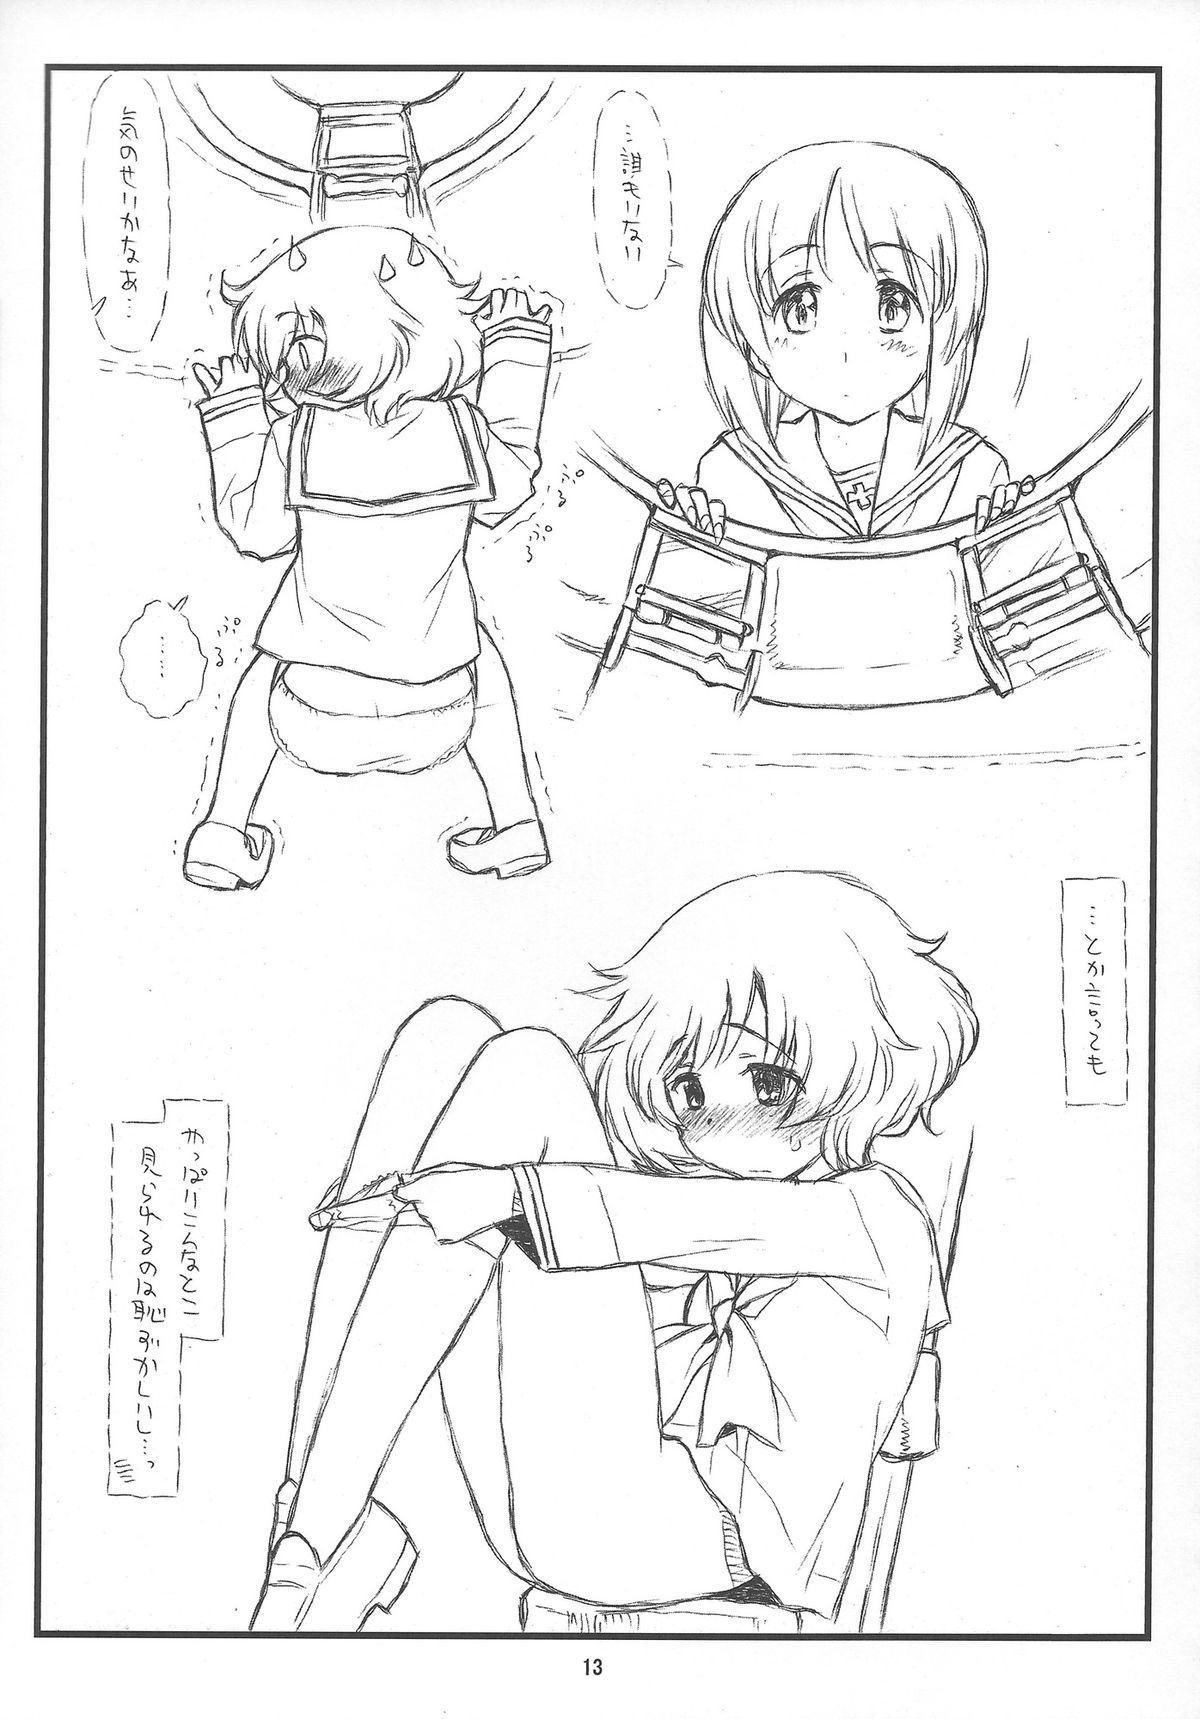 (C84) [bolze.] 「Honanie + Akiyama-dono Sennyudaisakusen (Sippai)」 (Girls und Panzer) 12